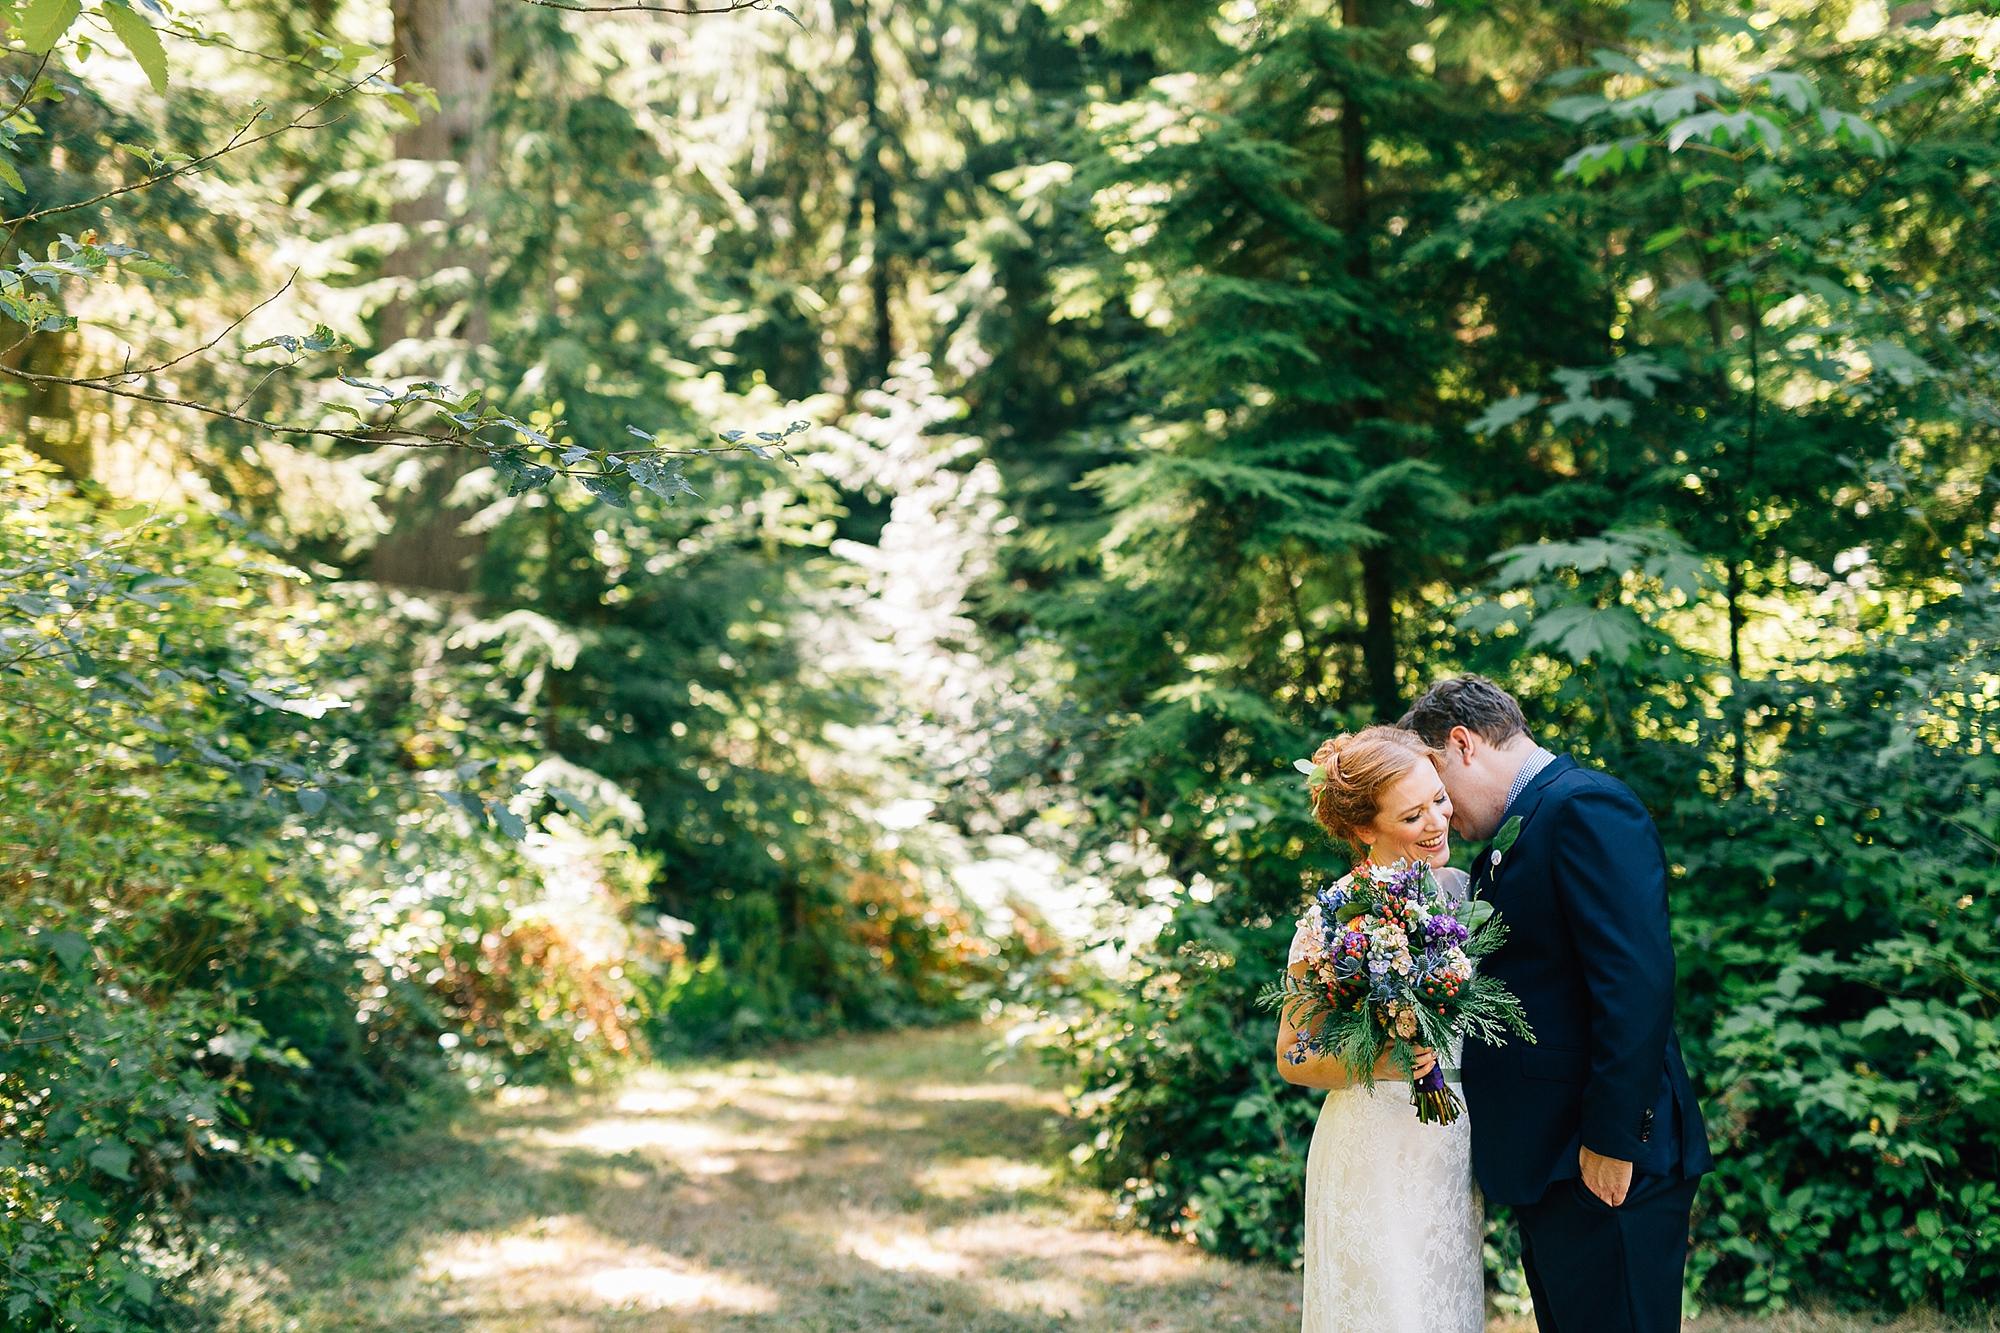 ashley vos photography seattle area wedding photographer_0701.jpg